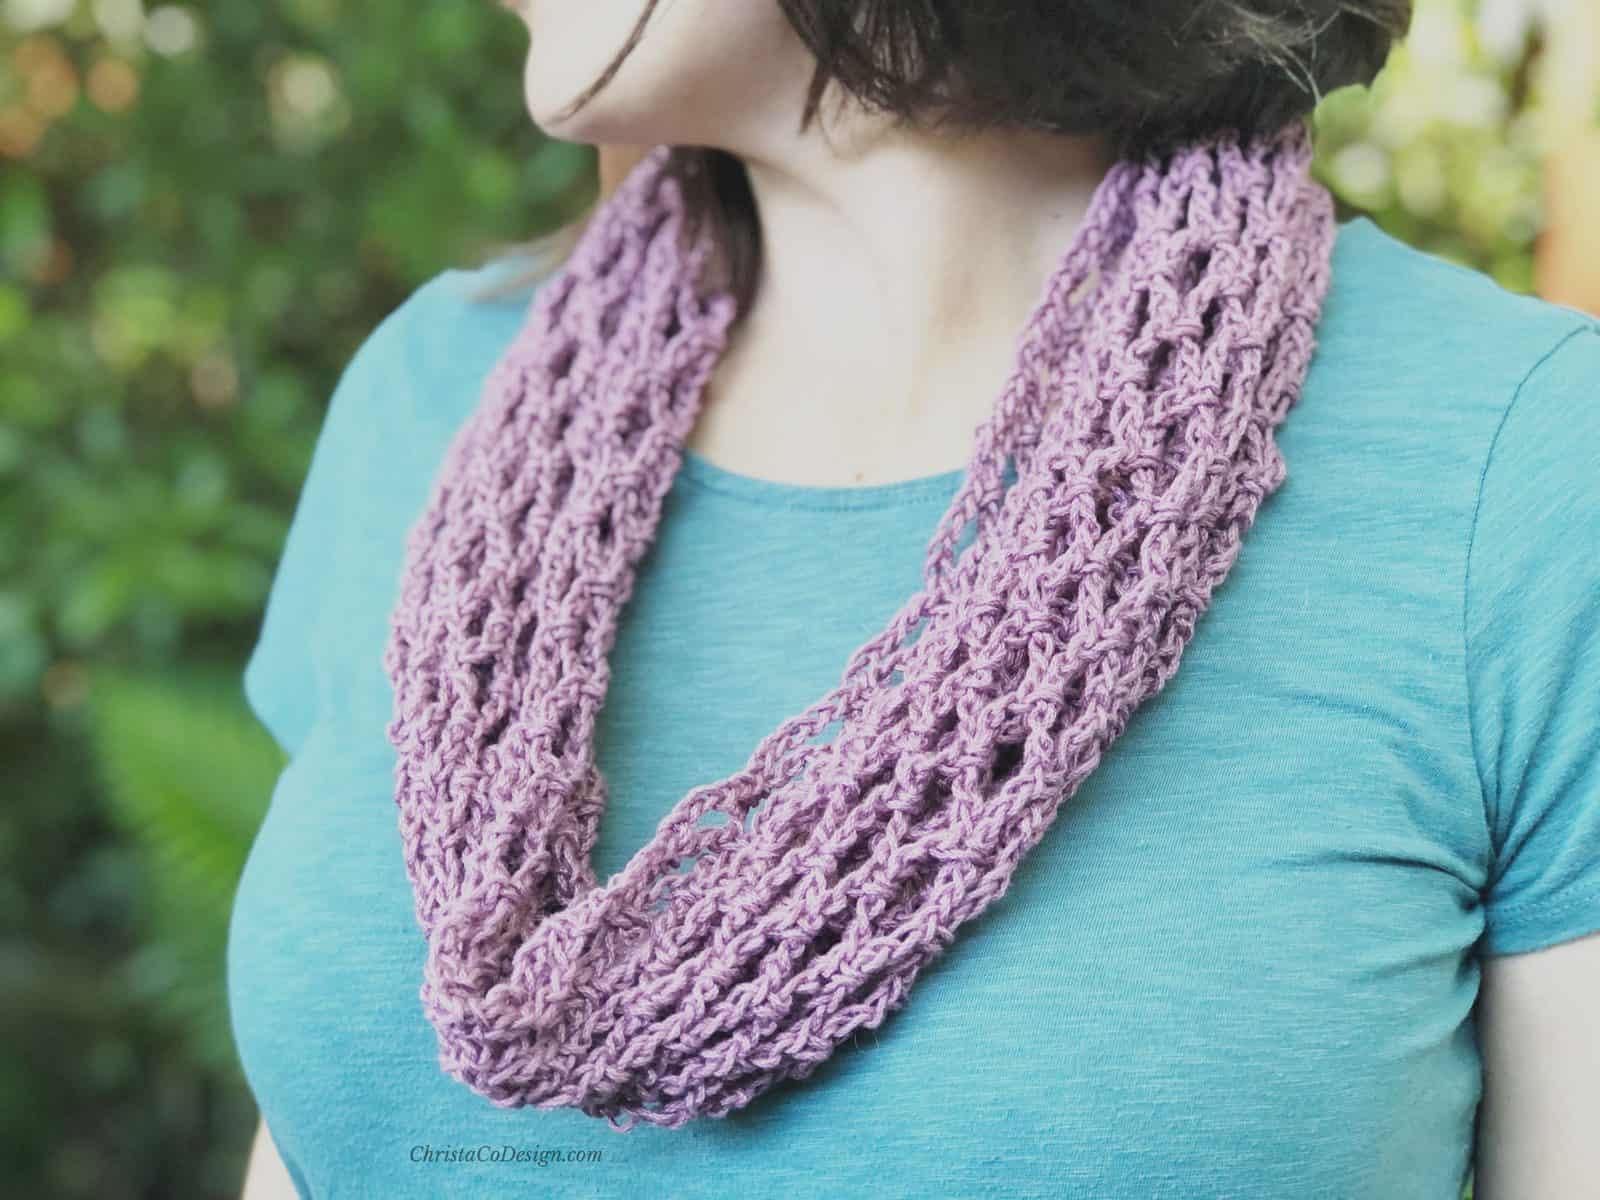 picture of woman wearing purple mesh crochet cowl